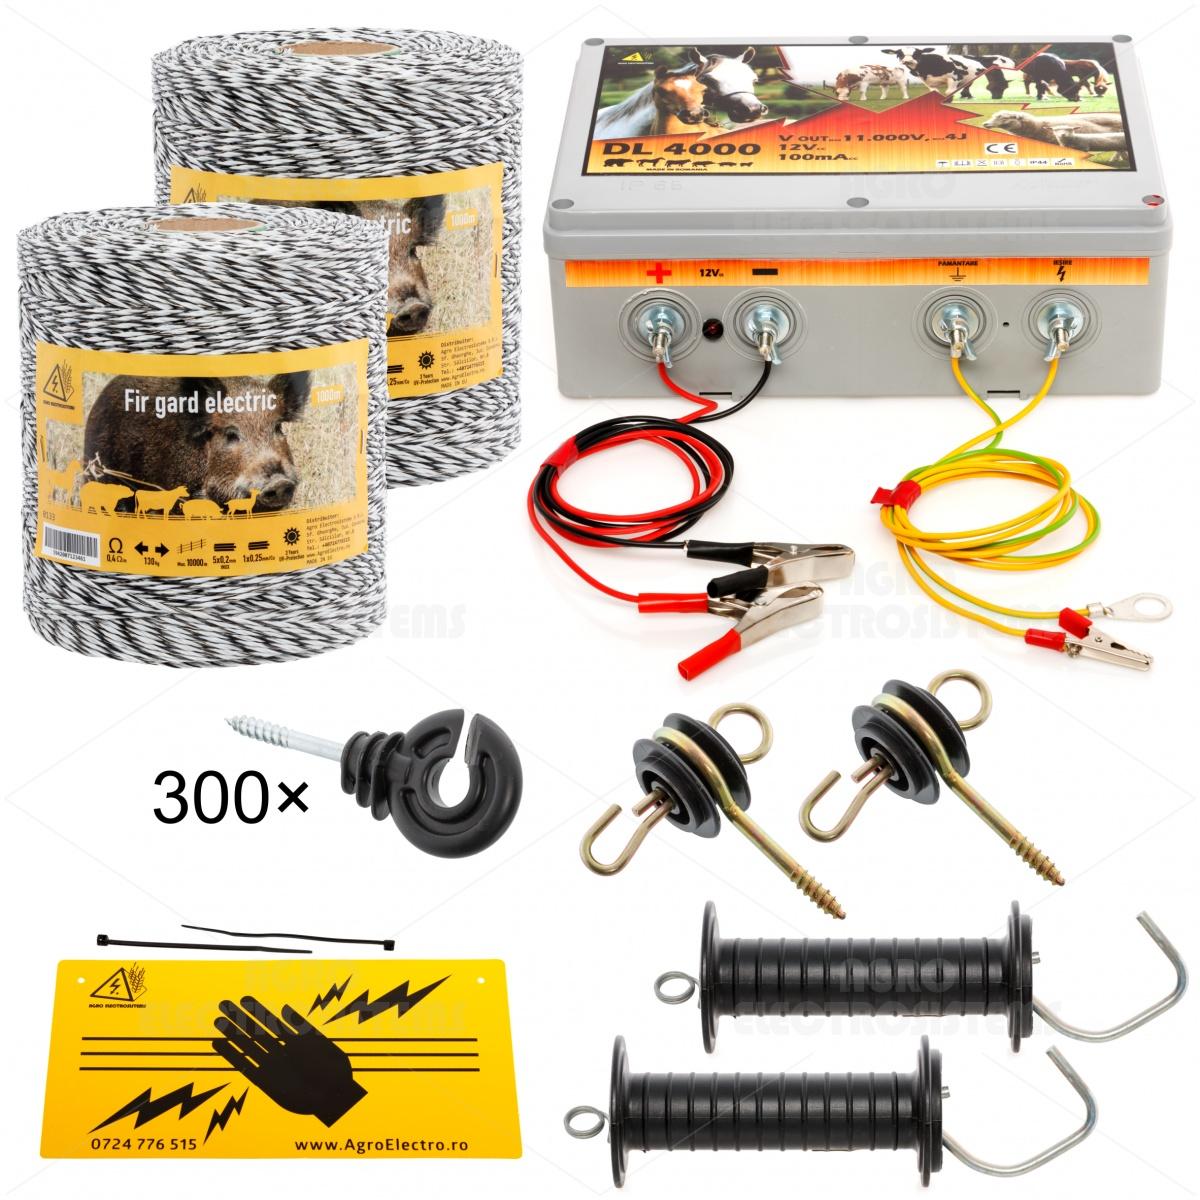 Pachet gard electric cu fir 2000m, pentru 25 sau 6,25 Ha